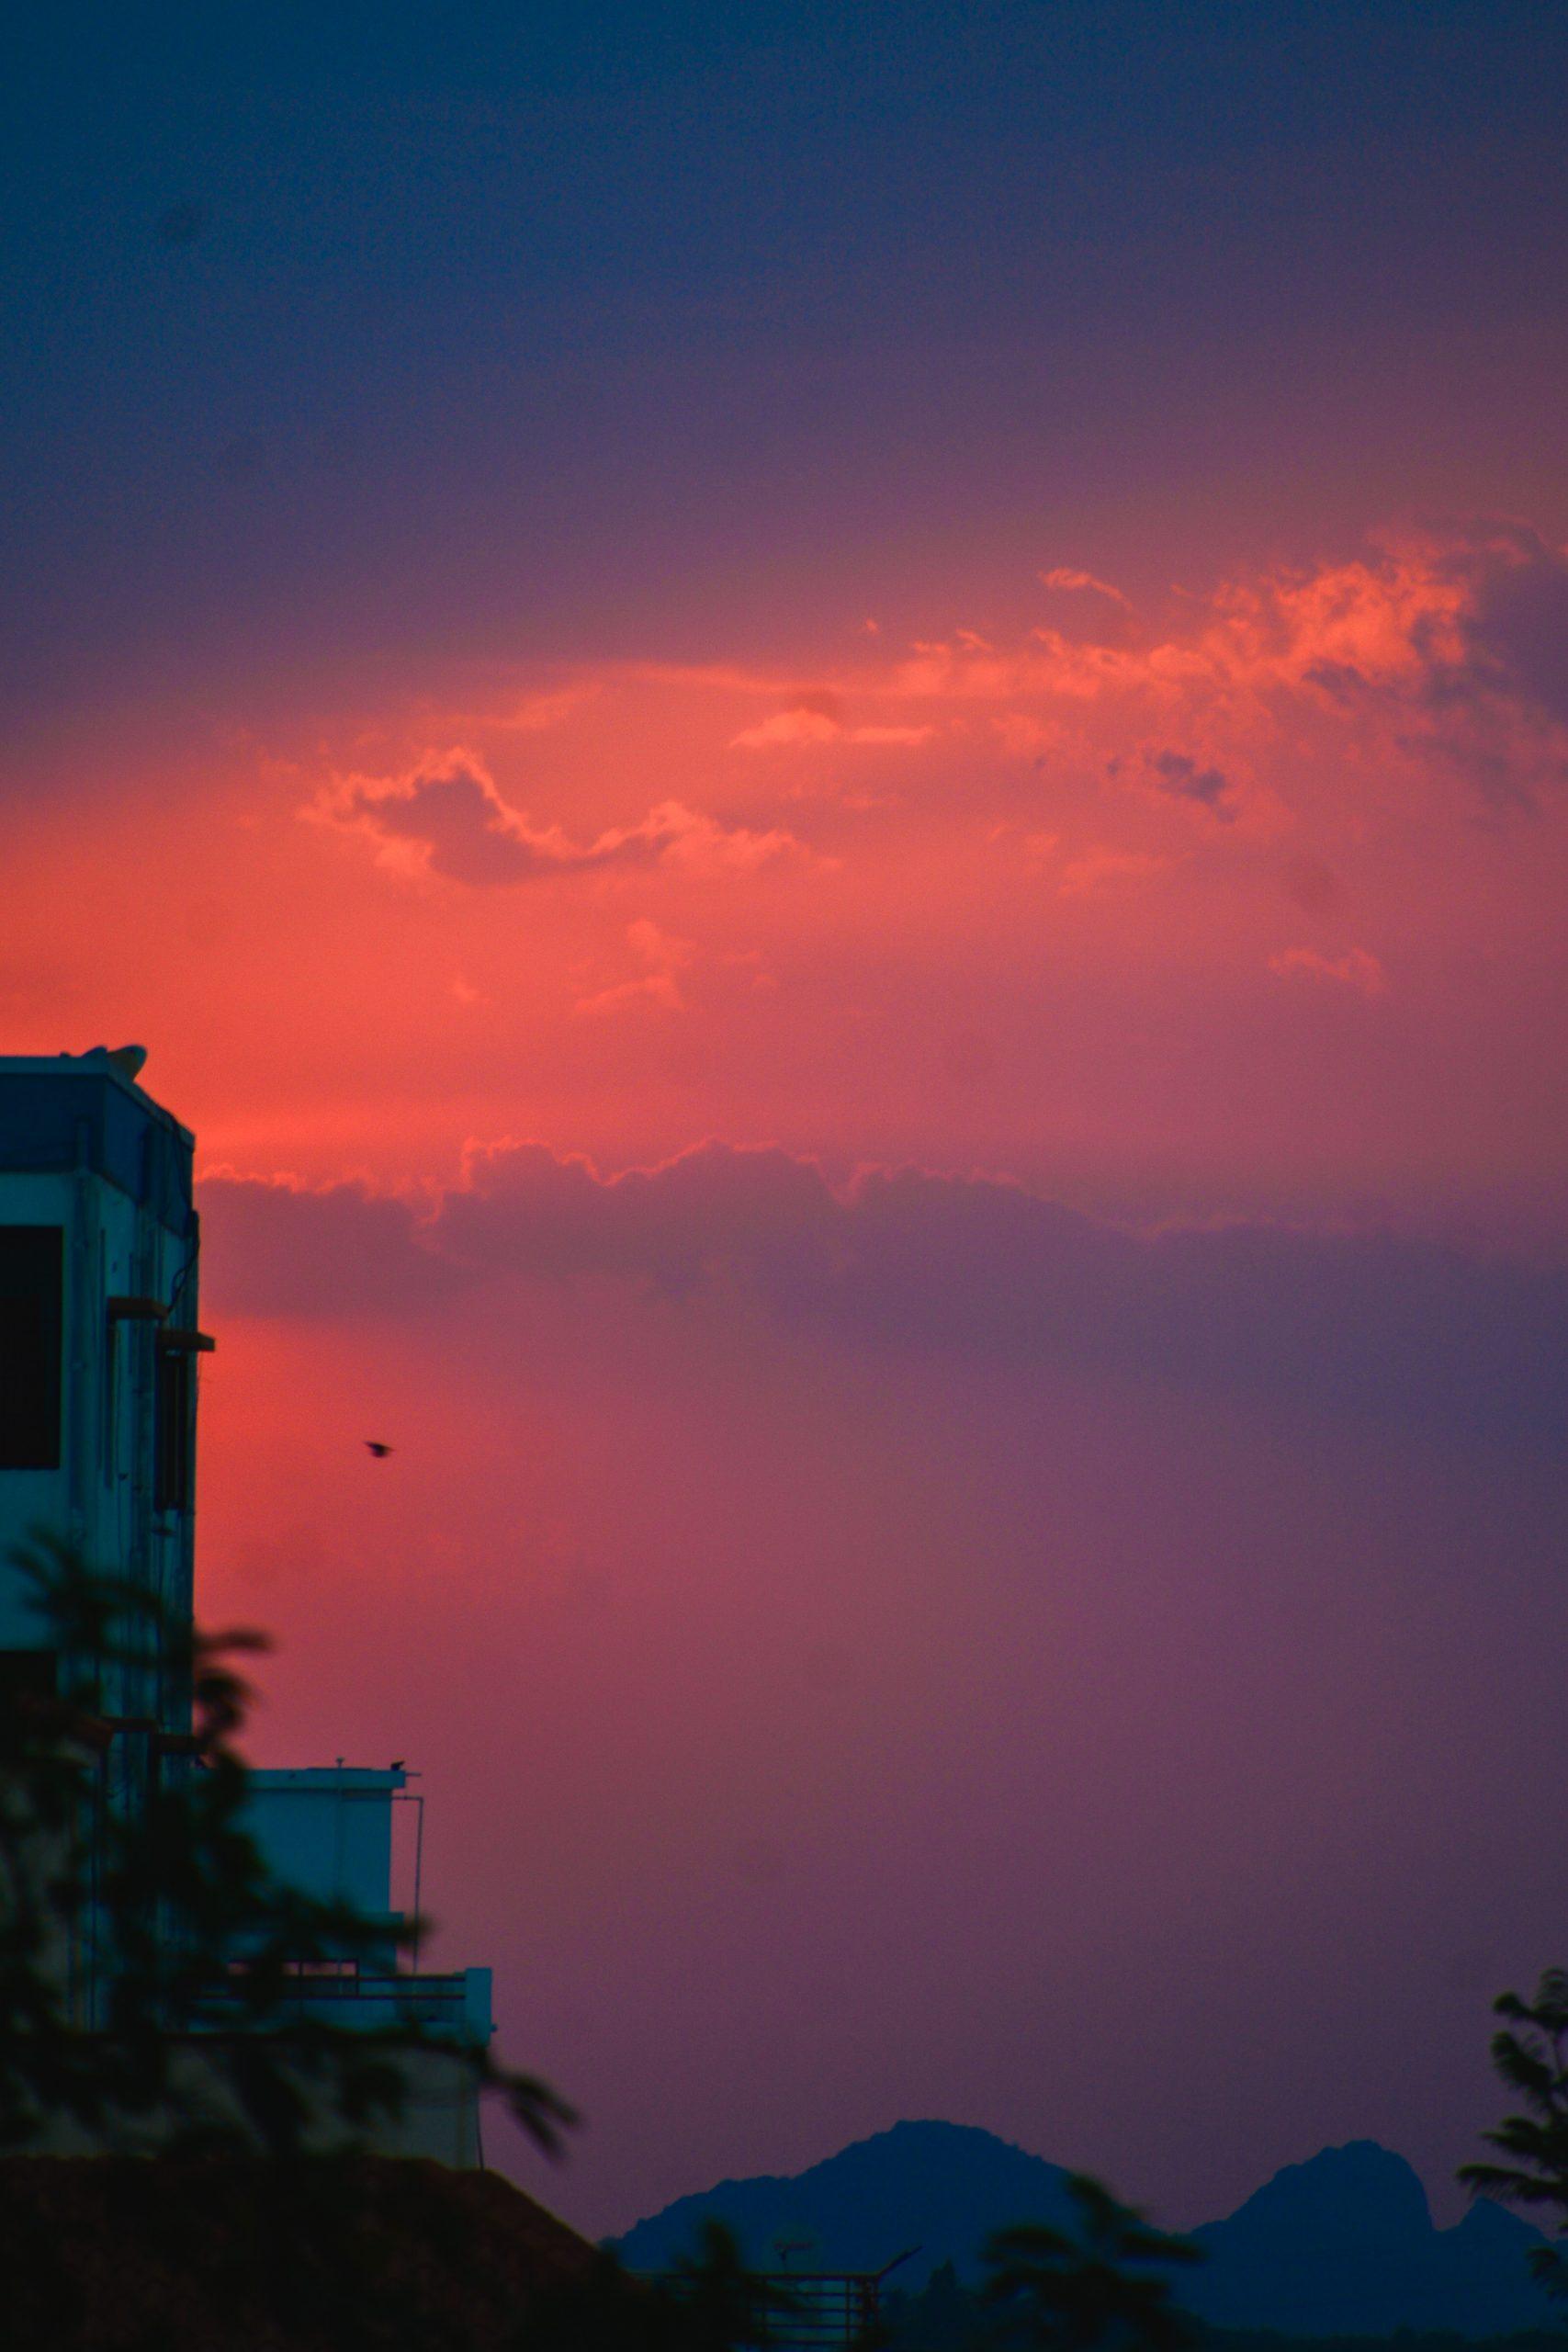 Golden sky during sunset